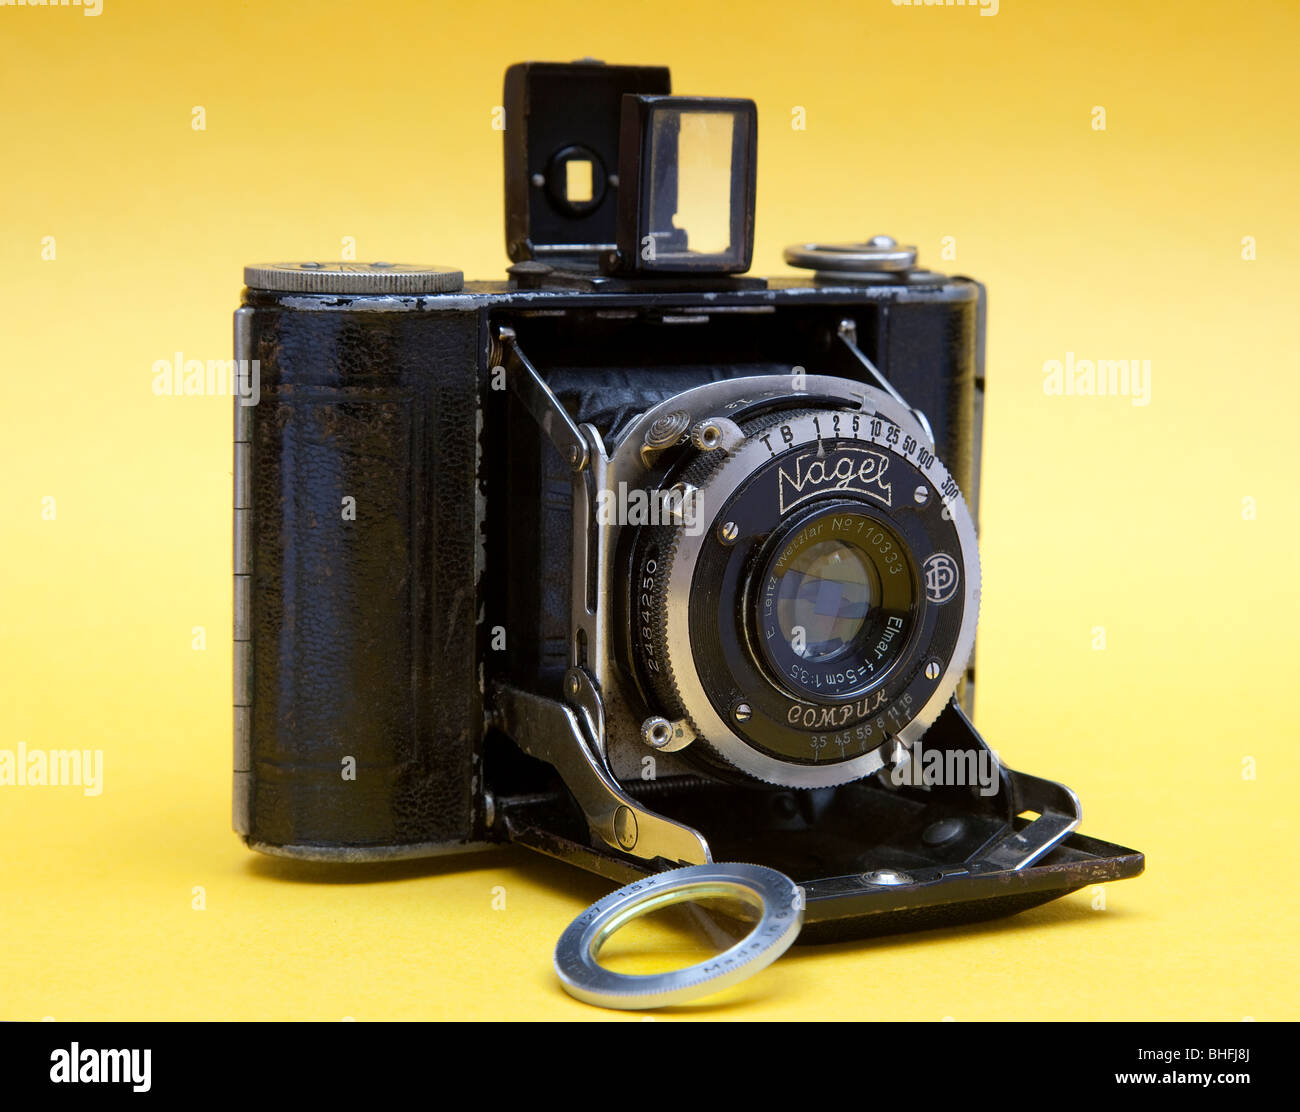 Vollenda Nagel 1920's pocket camera. - Stock Image